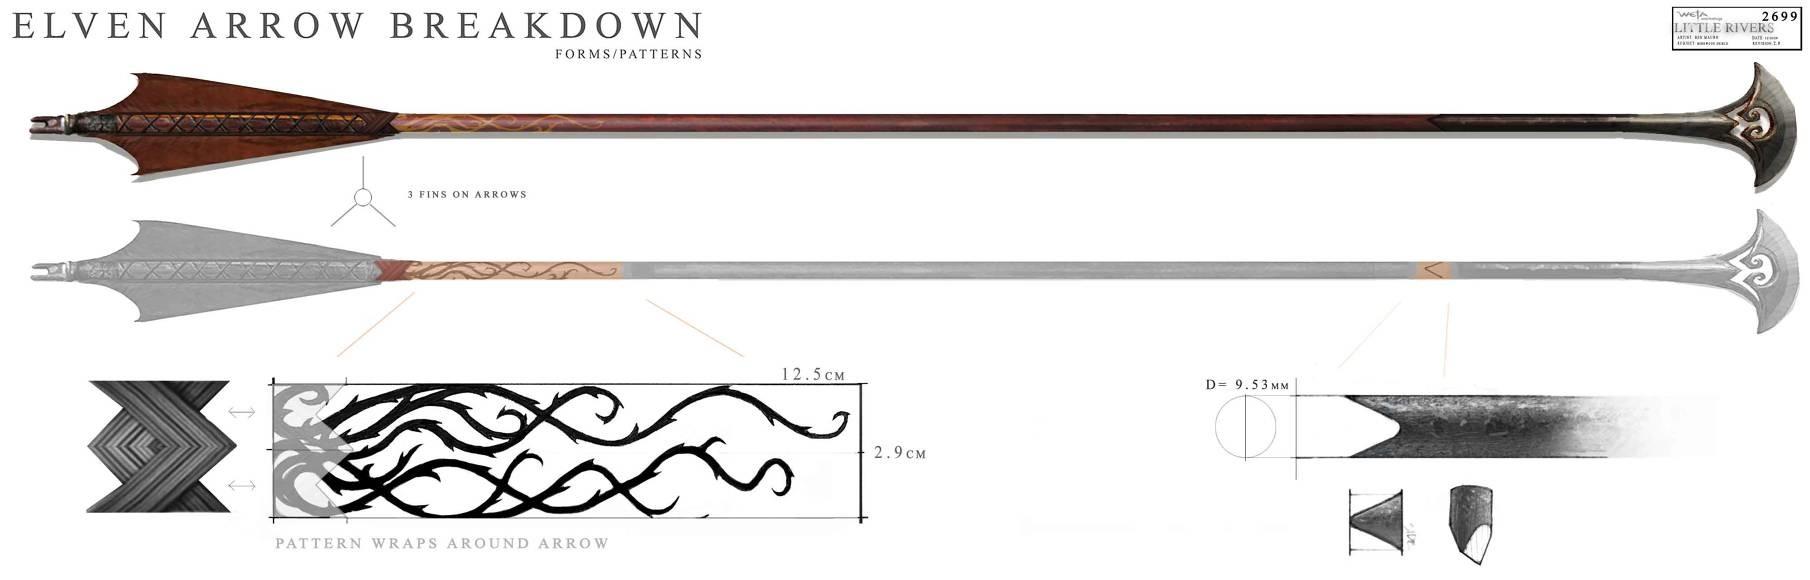 Ben mauro 2699mirkwood arrow2 breakdown bm 905 2x